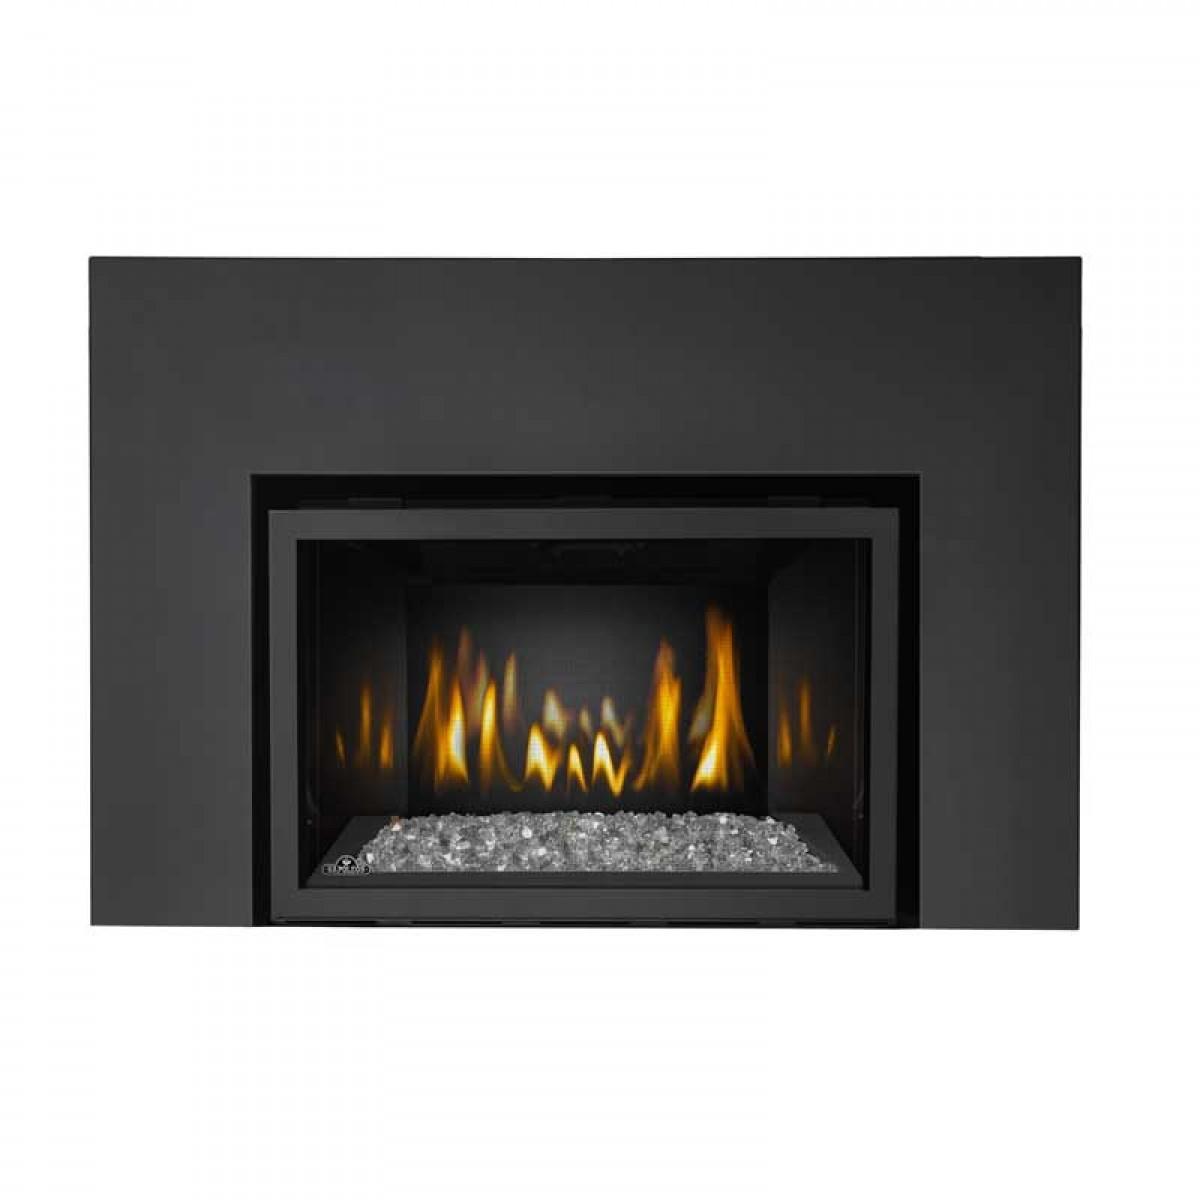 Napoleon Ir3g Infrared Series Gas Fireplace Insert